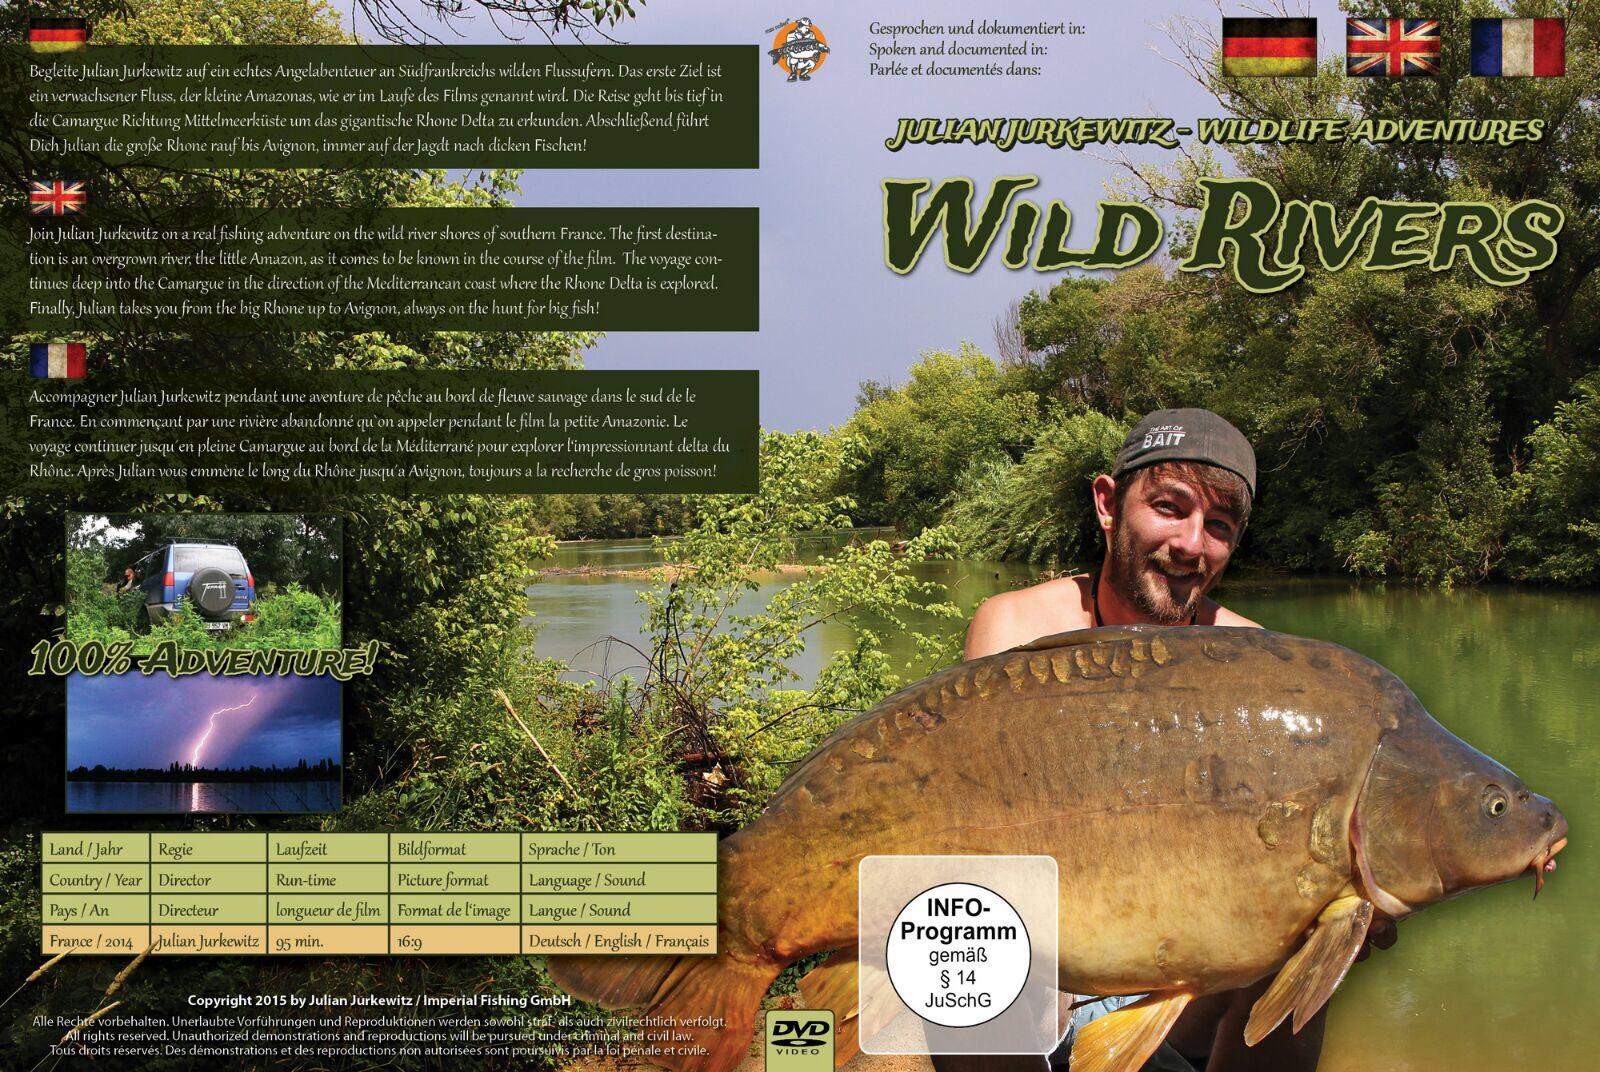 IMG 9213 -  - Wild Rivers, Real, julian jurkewitz, imperial fishing, frankreich, Fluss, Echt, DVD, Authentisch, angeln, Abenteuer